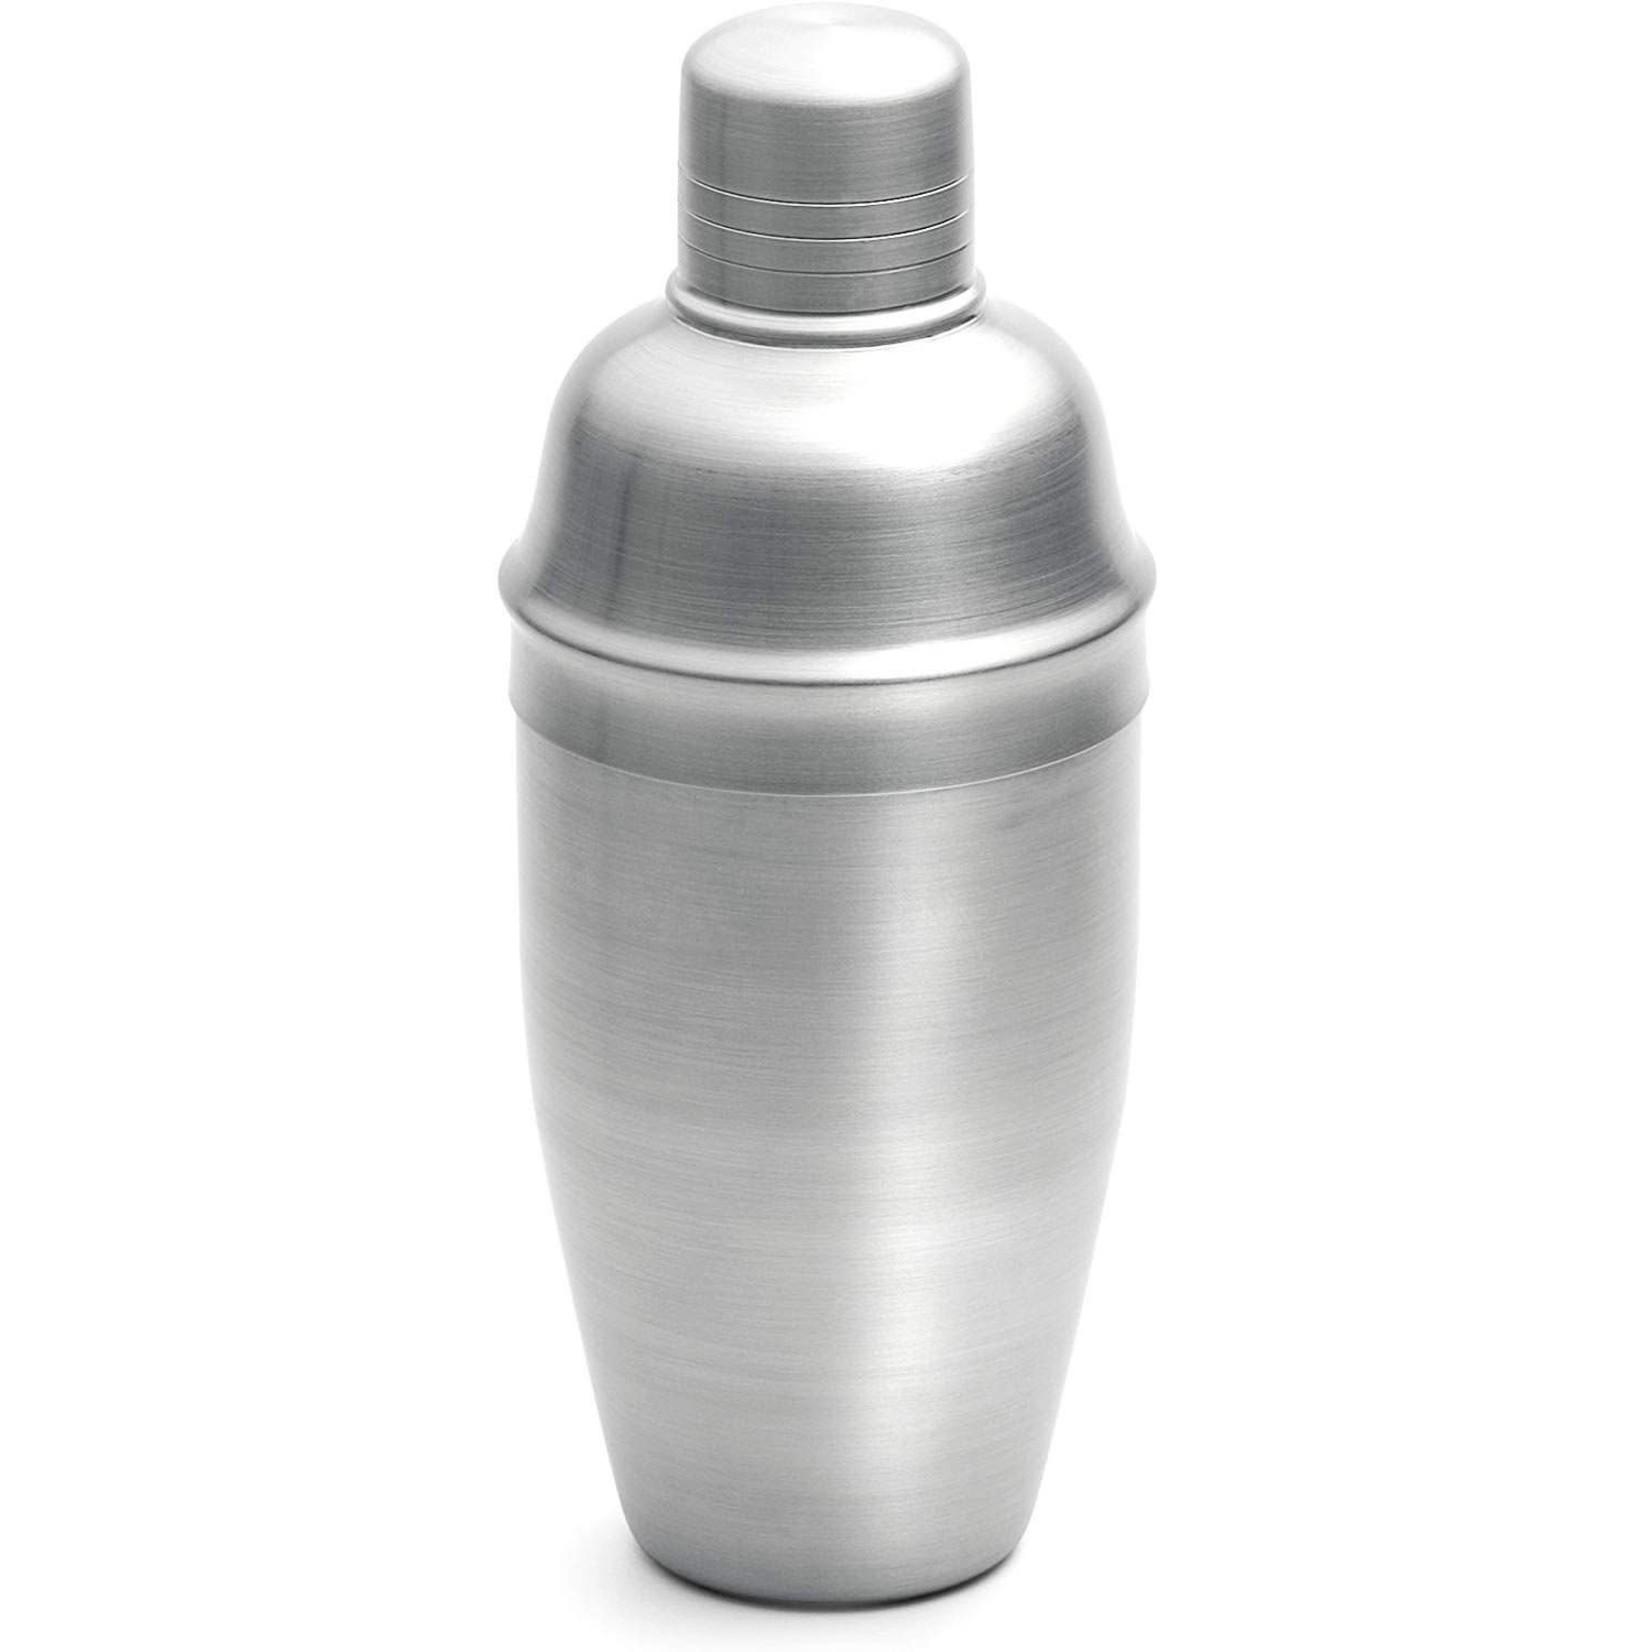 Weis Cocktailshaker RVS 0,5L